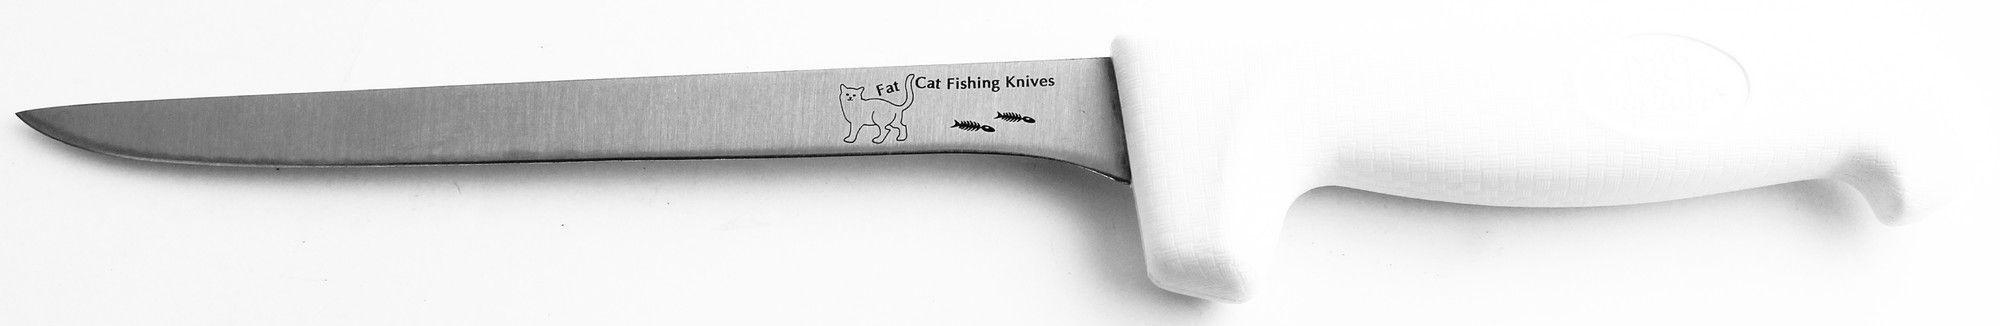 ProSafe Fat Cat Straight Fillet Knife